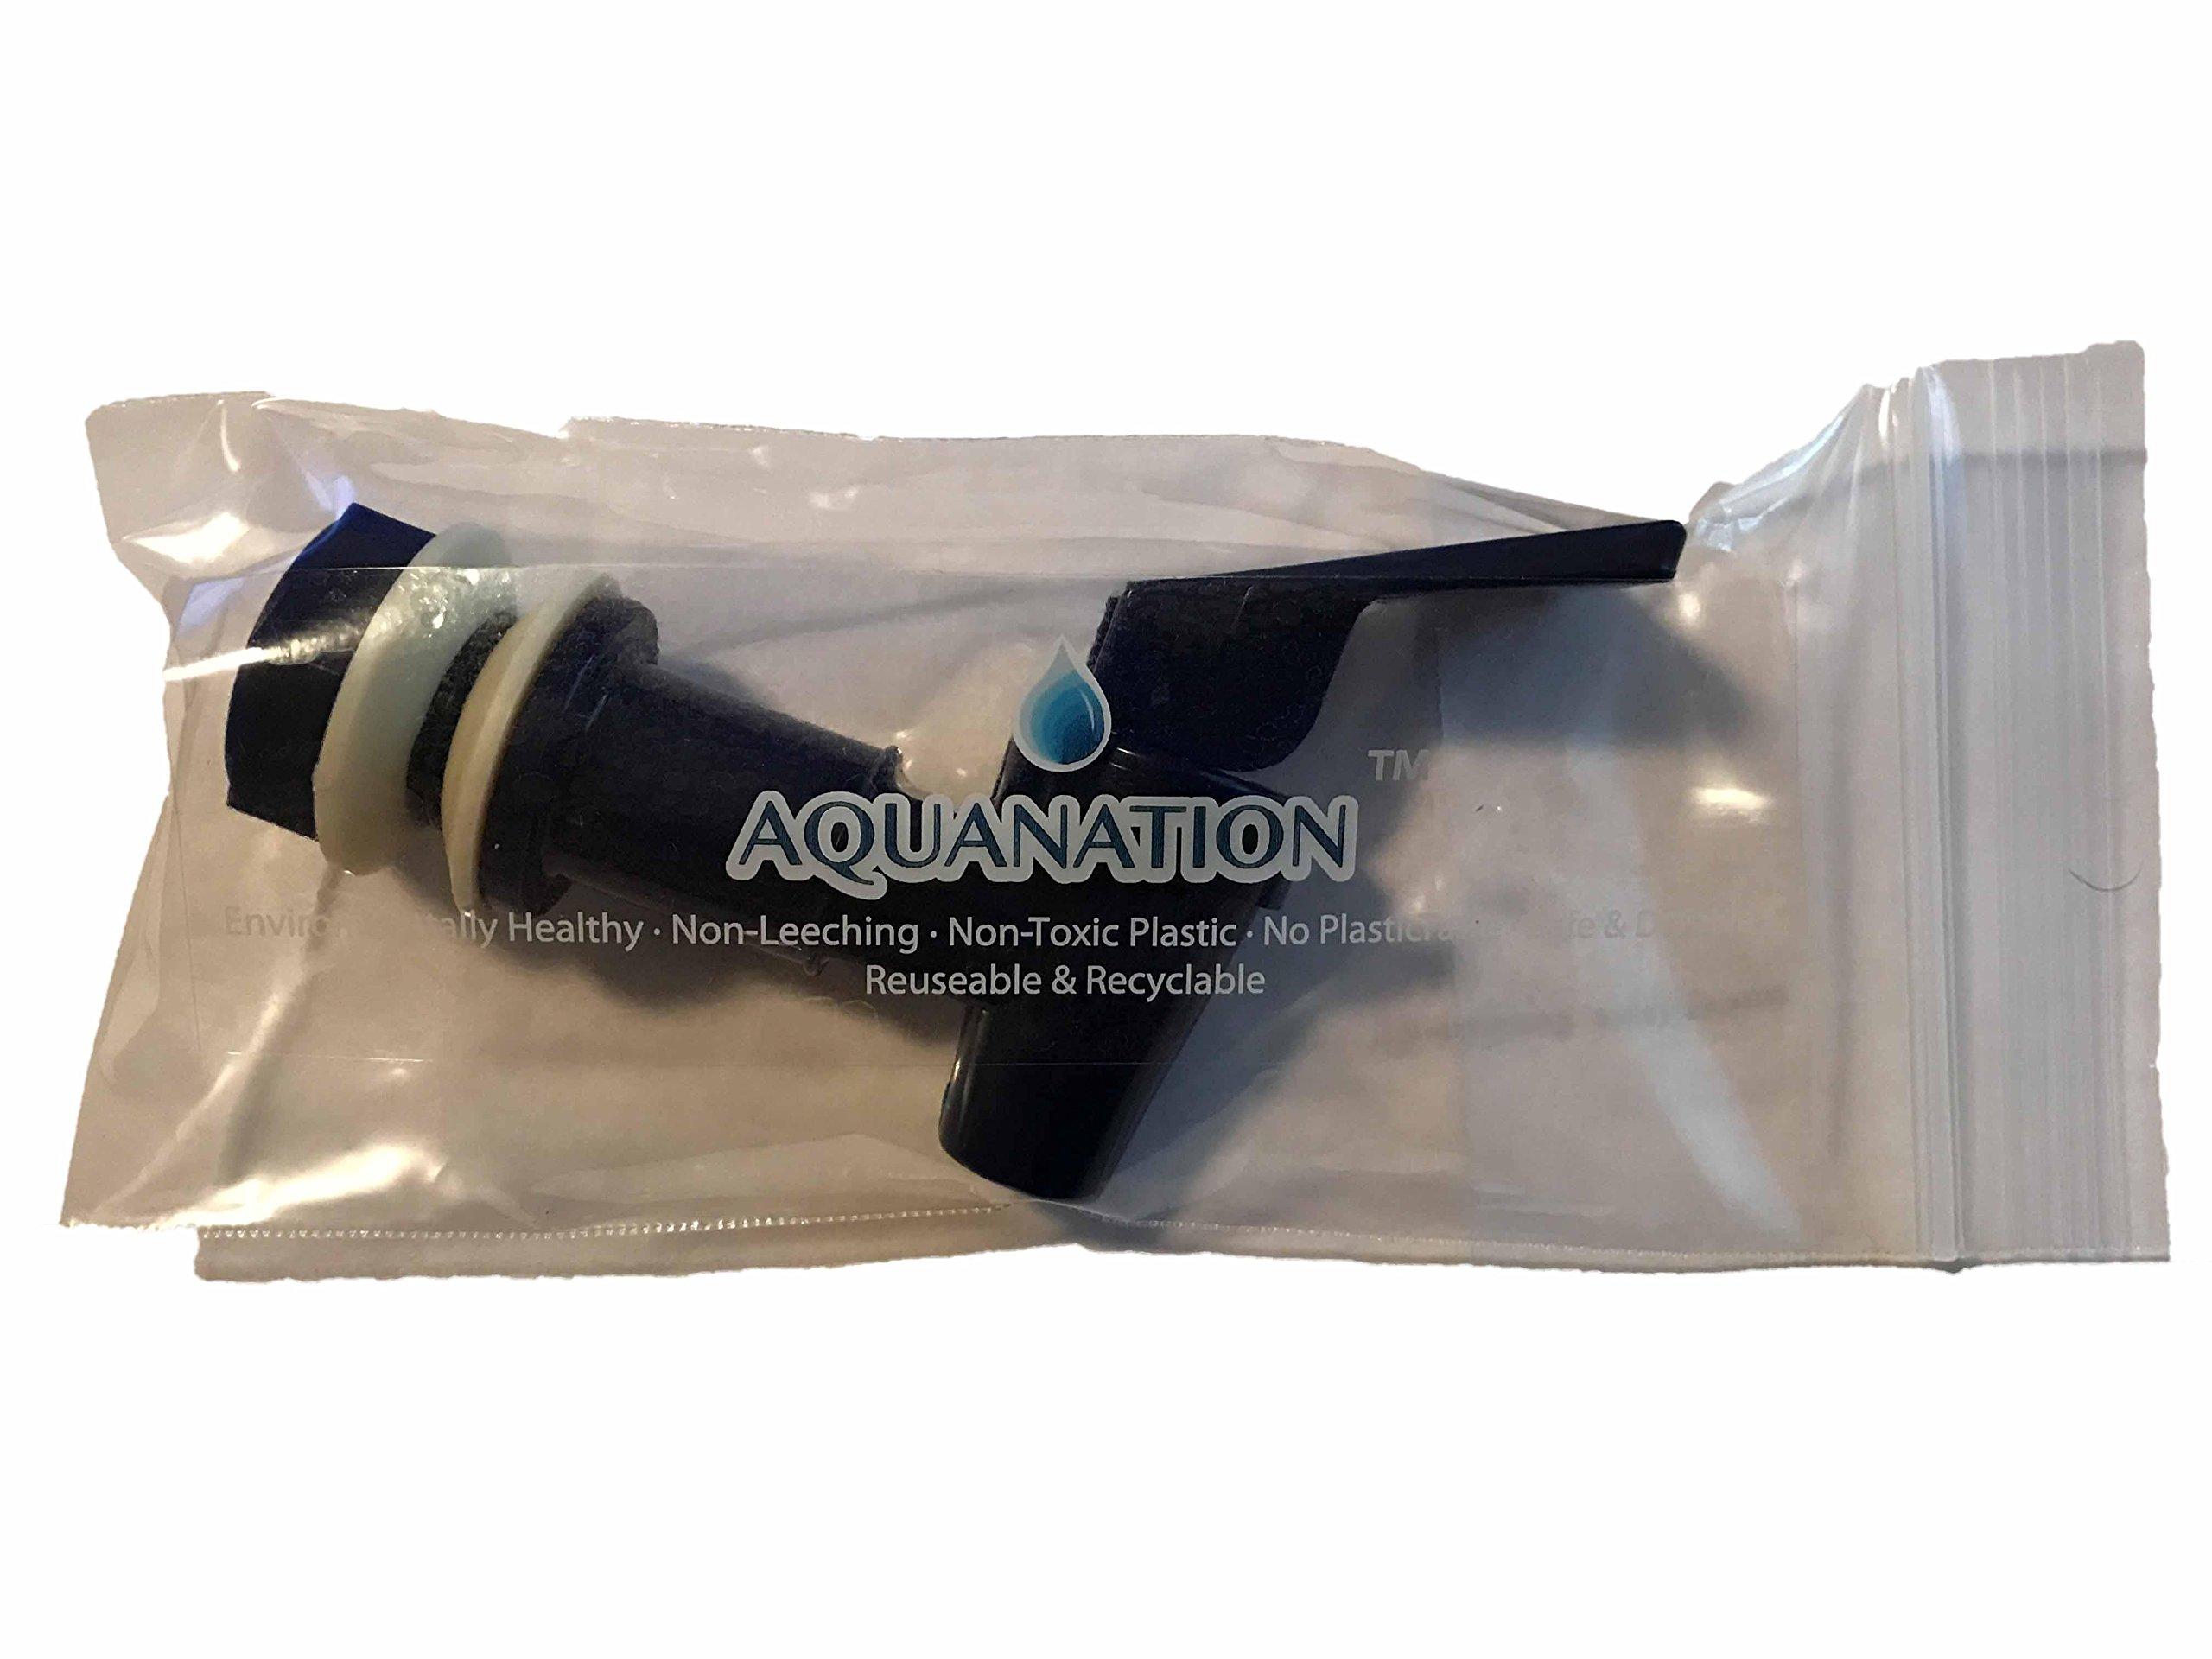 AquaNation BPA Free Replacement Cooler Faucet Water Bottle Jug Reusable Spigot Spout Water Beverage Lever Pour Dispenser Valve Water Crock Water Tap ((2) Twin Pack - Blue) by AquaNation